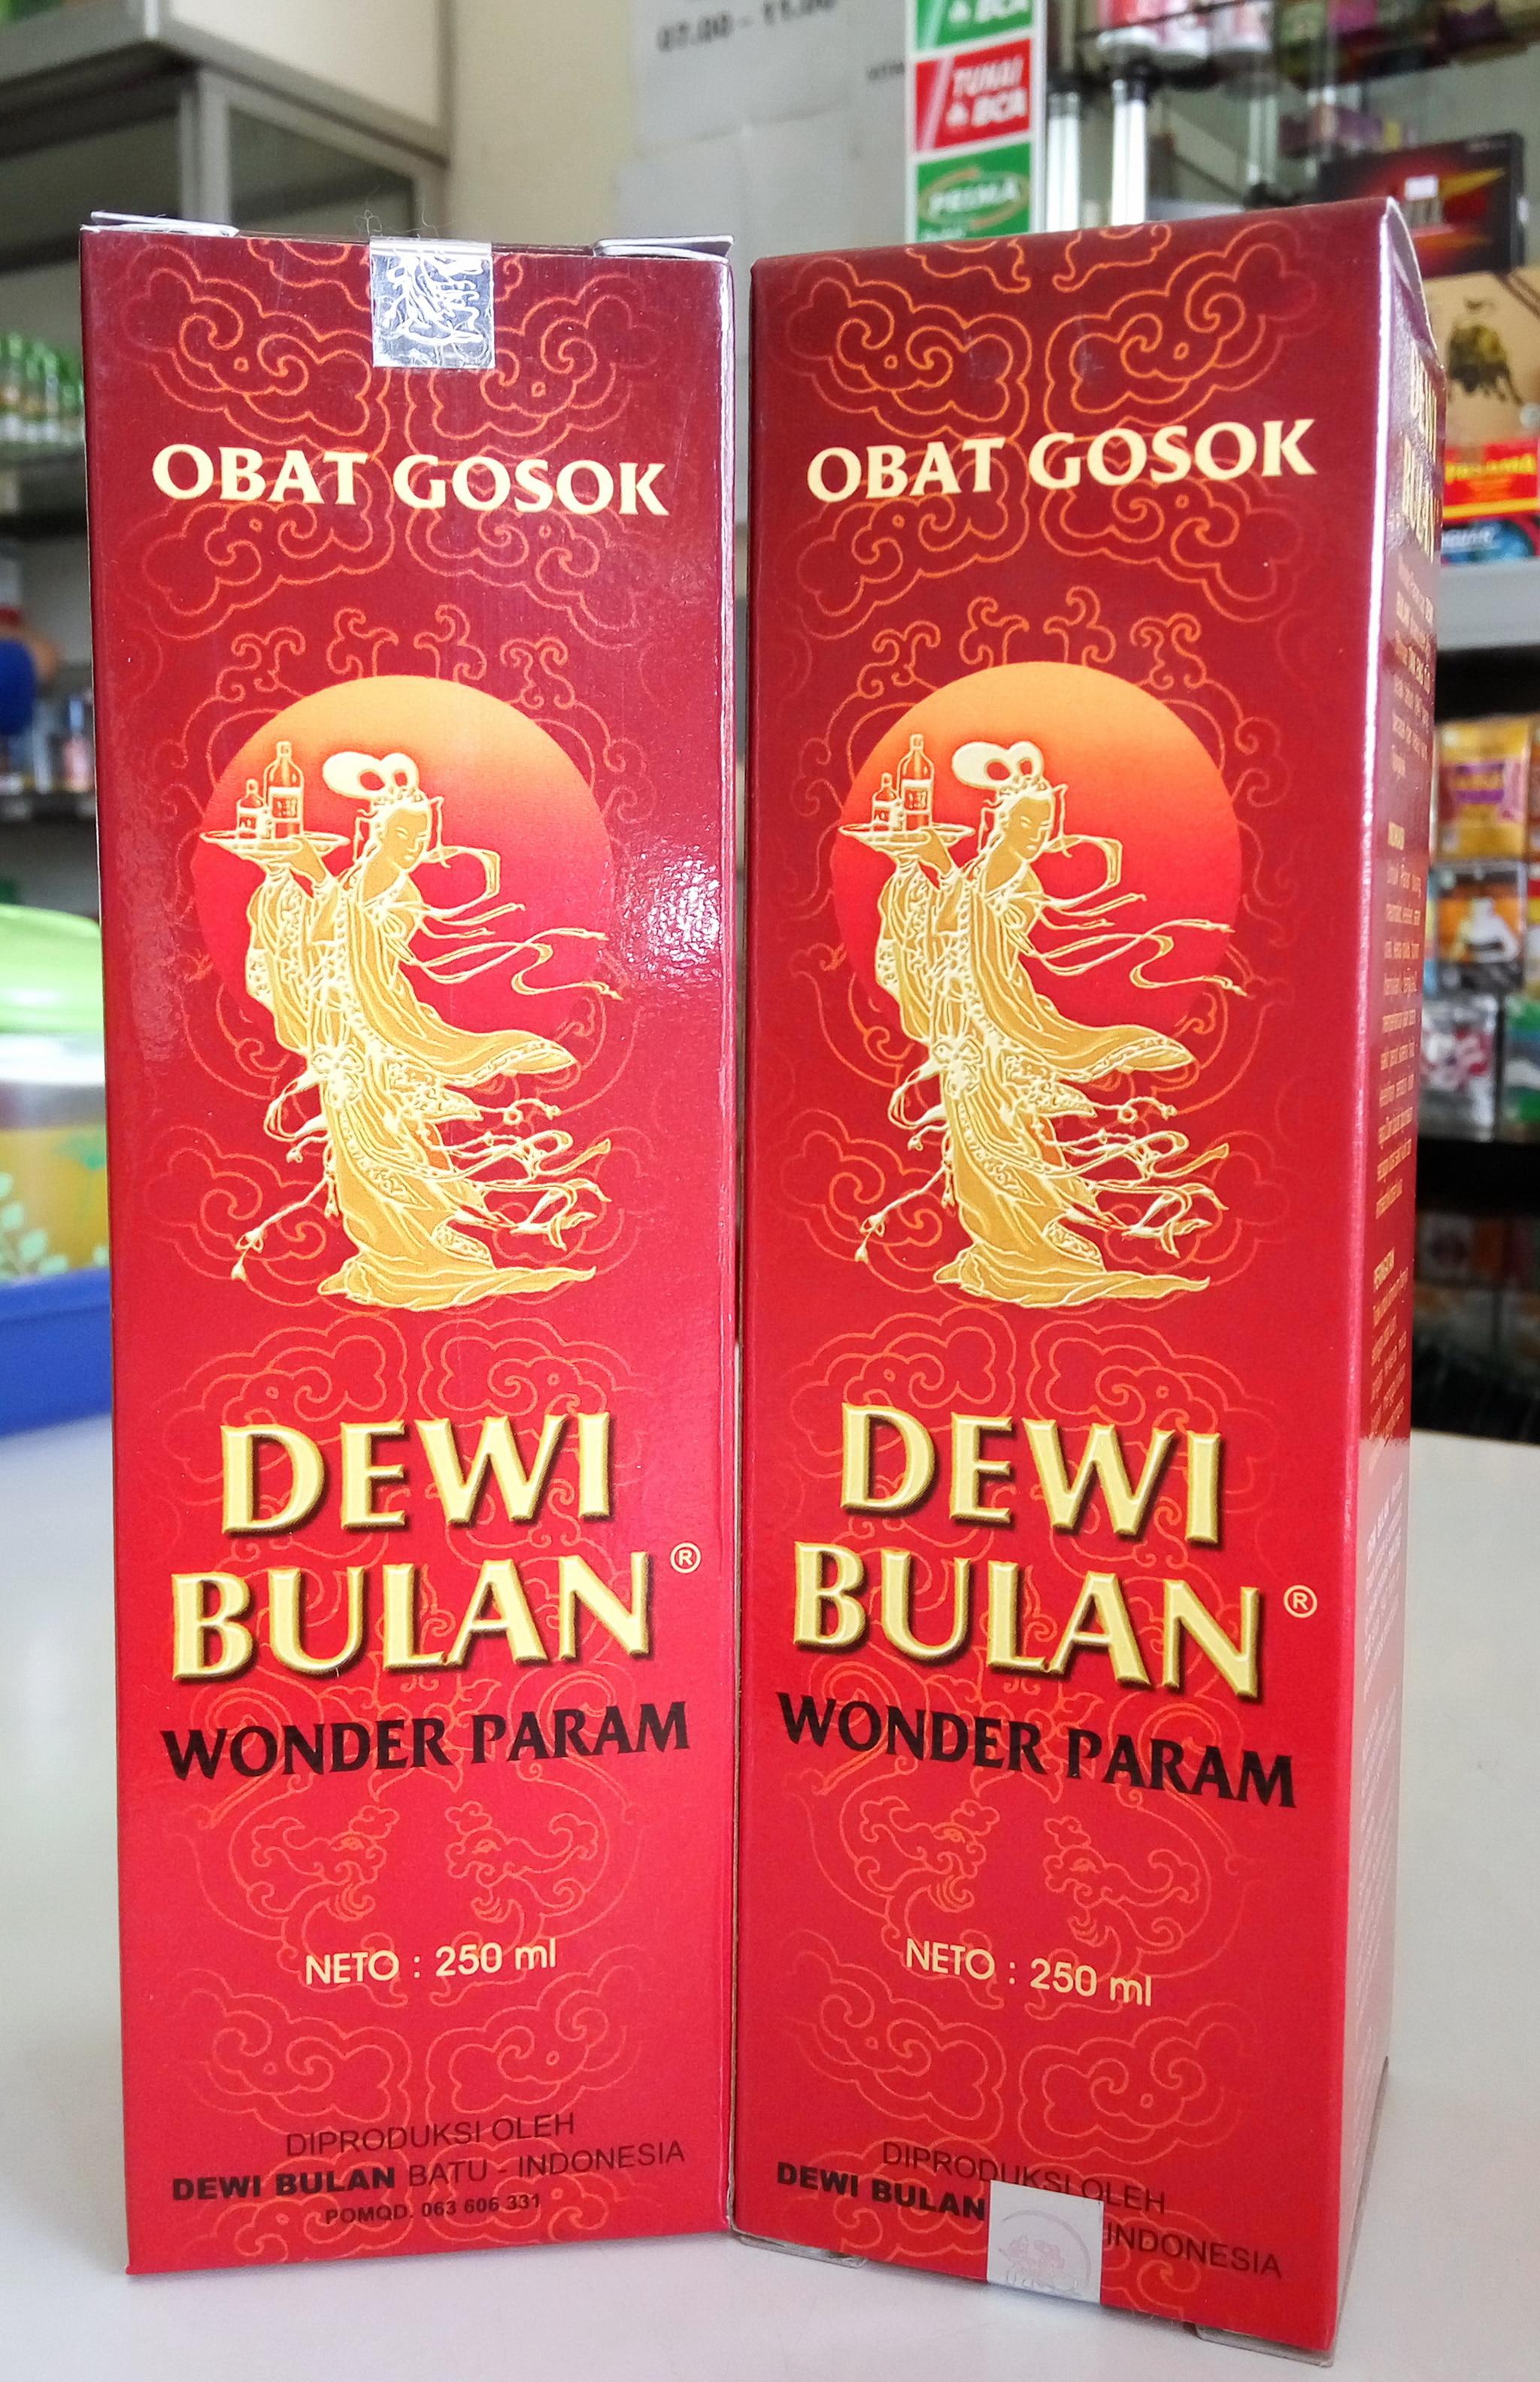 Jual Minyak Gosok Dewi Bulan Refill 250 Ml Toko Jago Tokopedia Obat Asam Urat Fengshijiu